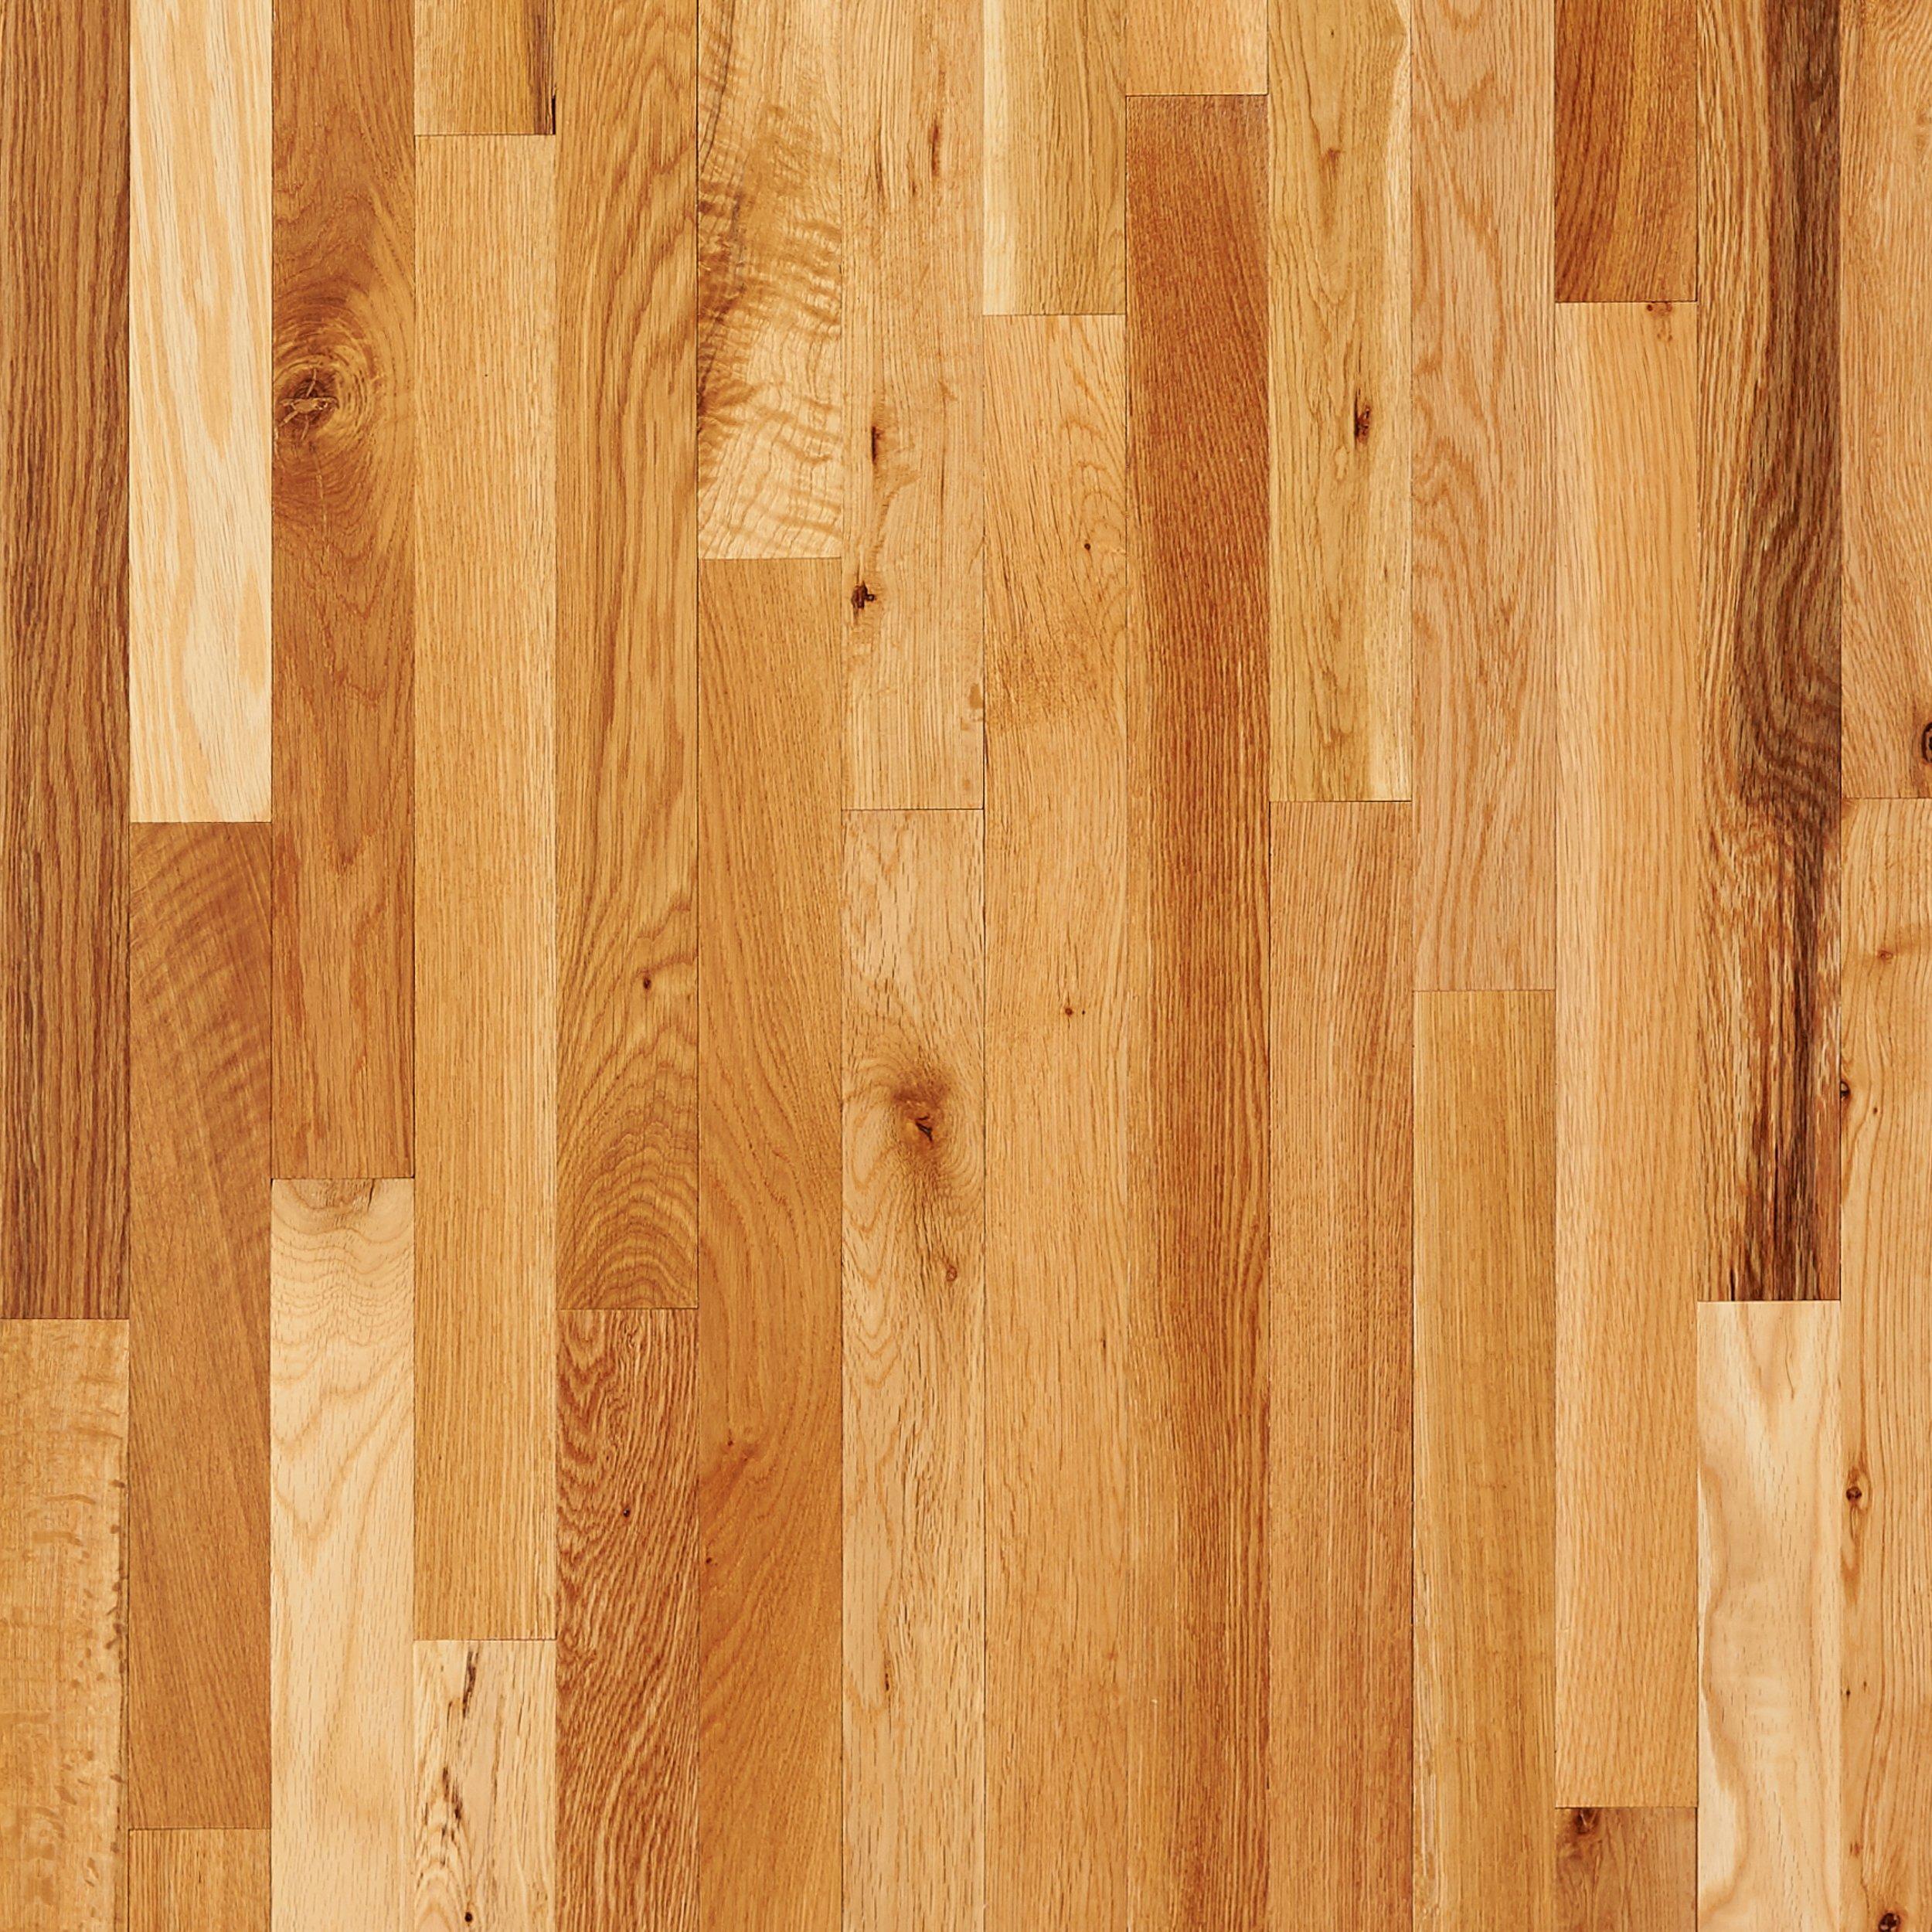 Natural Oak Solid Hardwood Floor Decor In 2020 Solid Hardwood Floors Oak Wood Floors Wood Floors Wide Plank